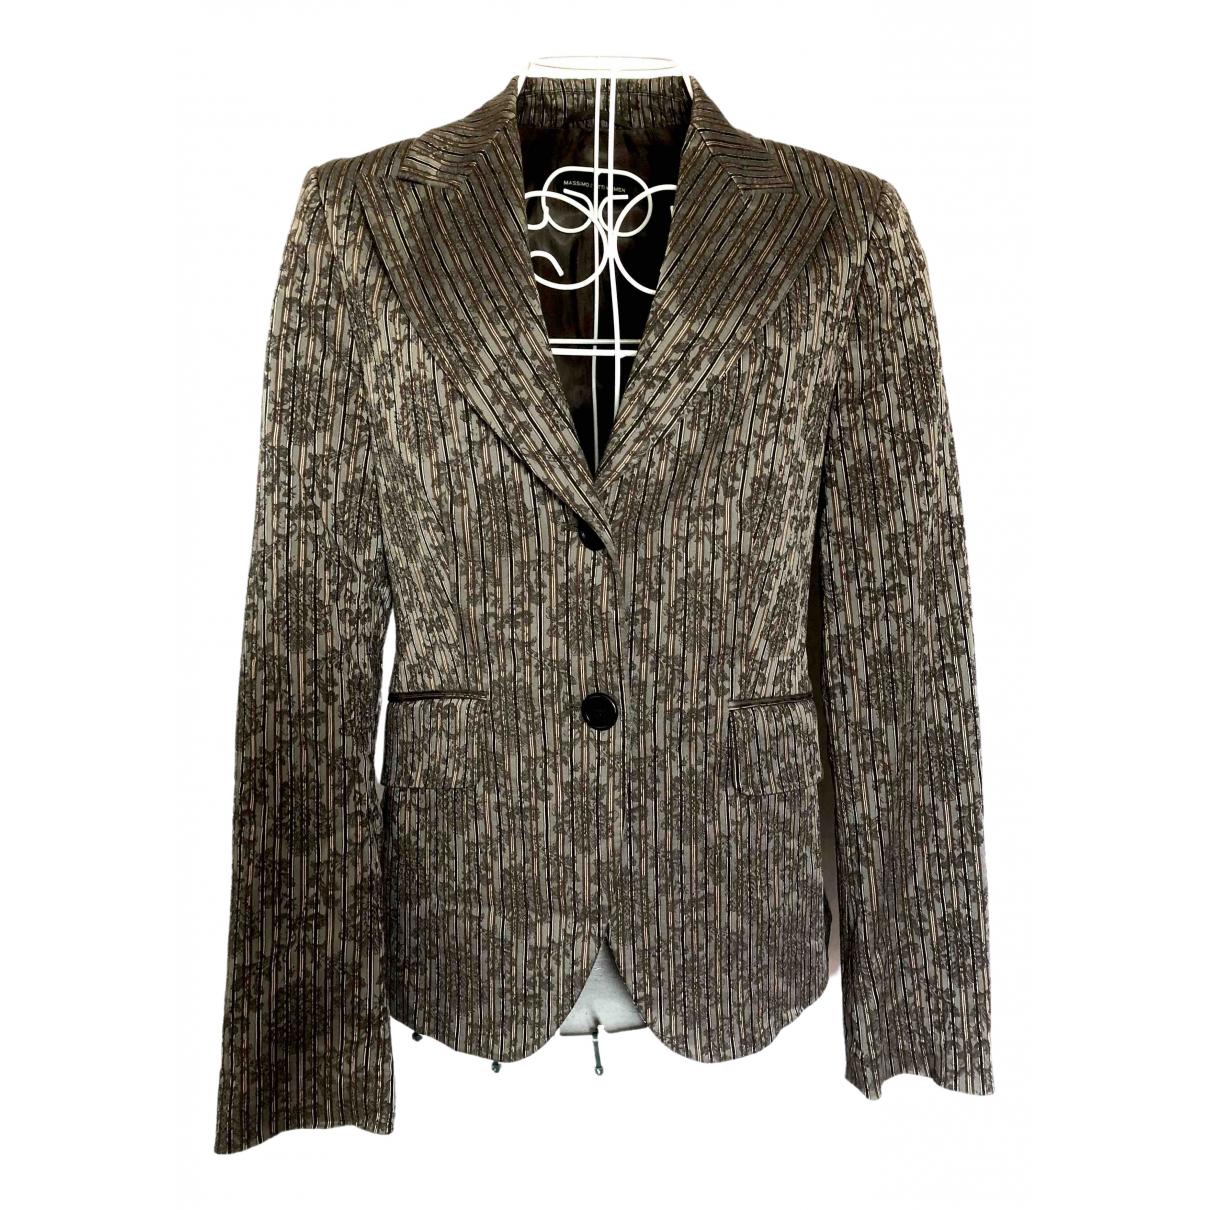 Massimo Dutti \N Multicolour Cotton jacket for Women M International